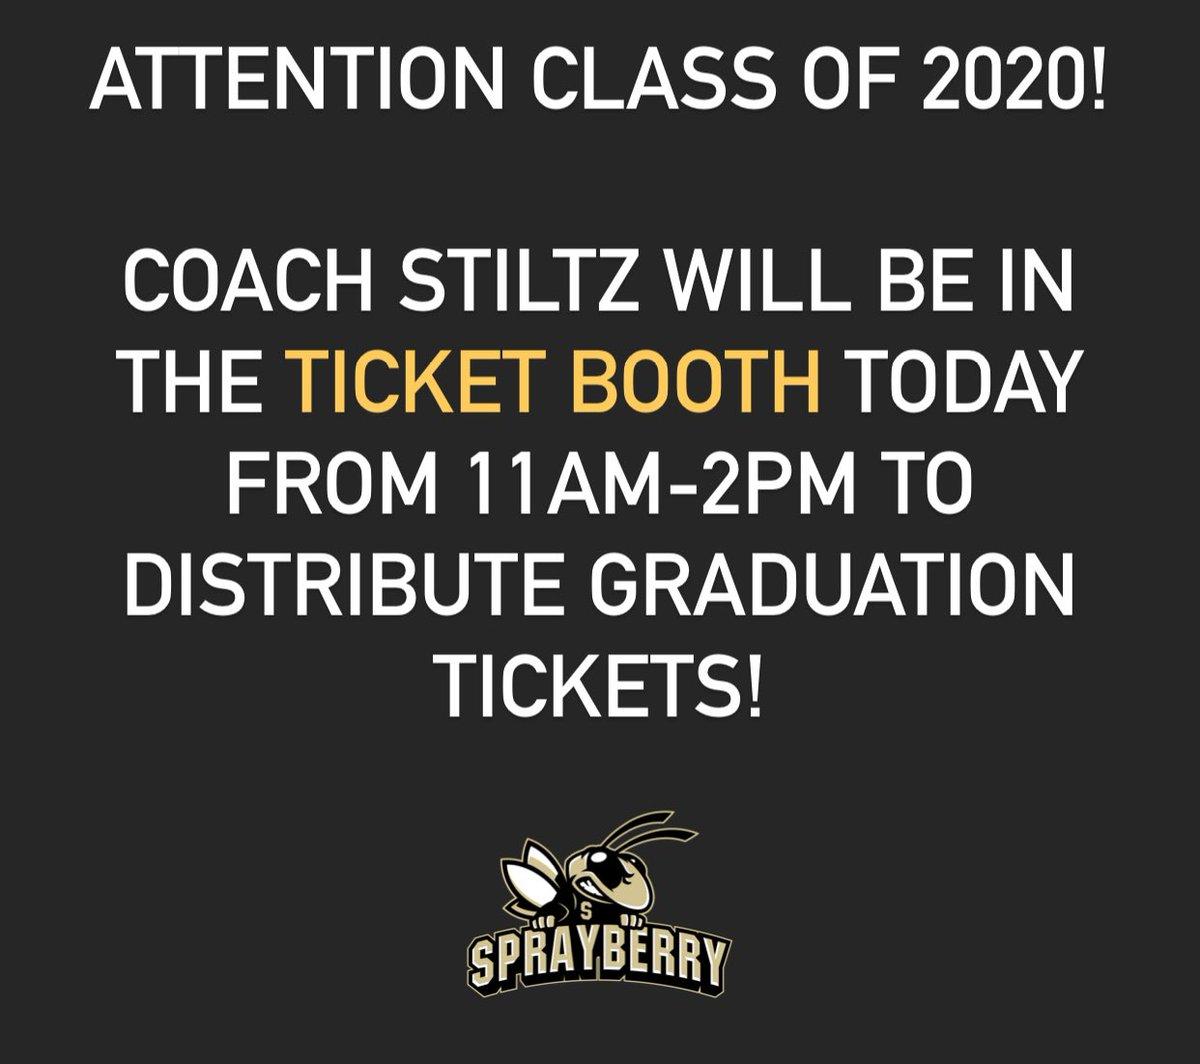 Graduation ticket distribution begins today! #shspositiveposting #wearesprayberry